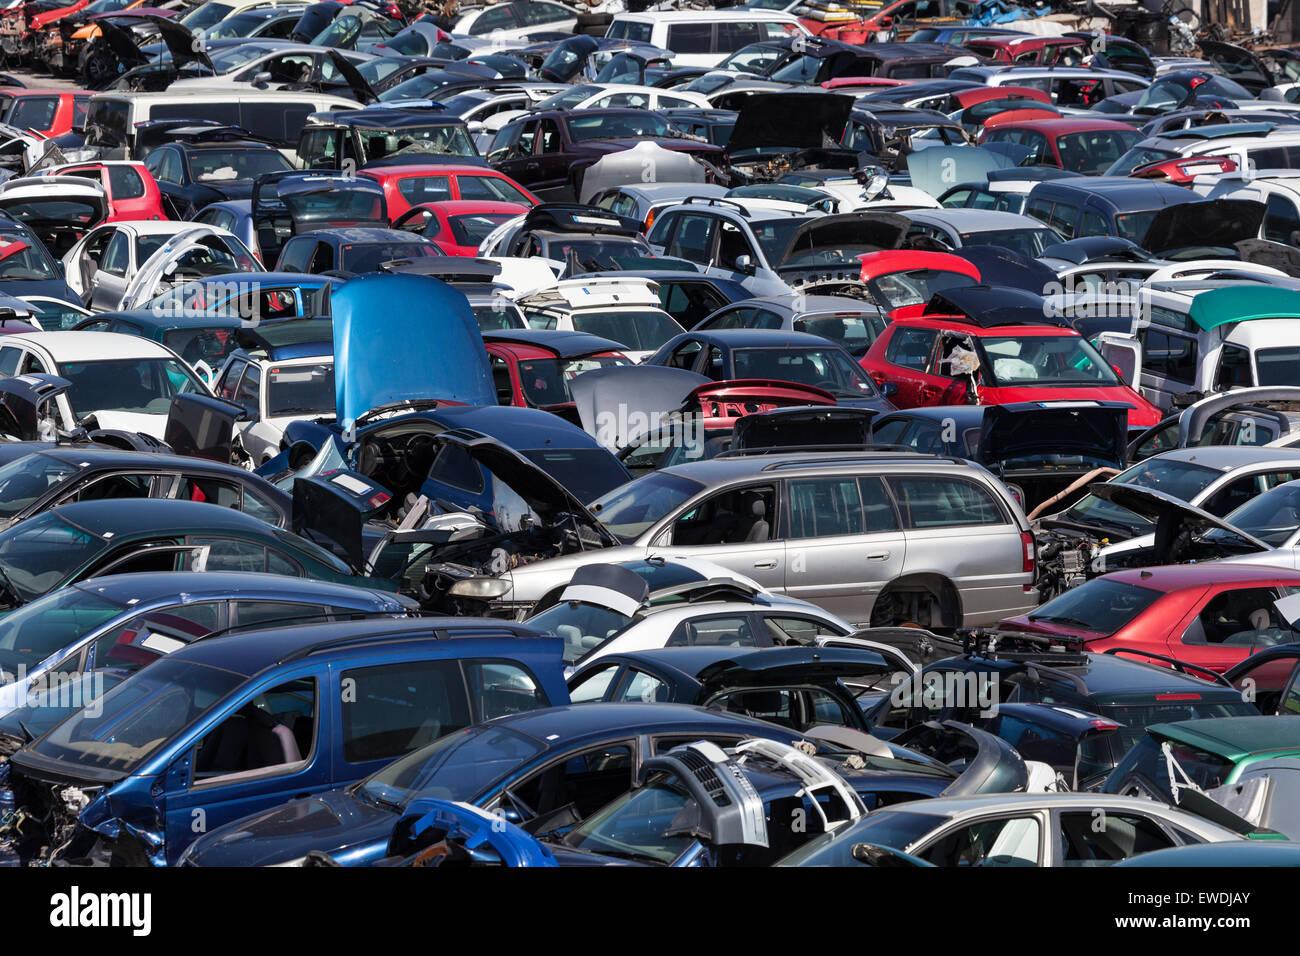 Hundreds of old cars at a scrap yard - Stock Image